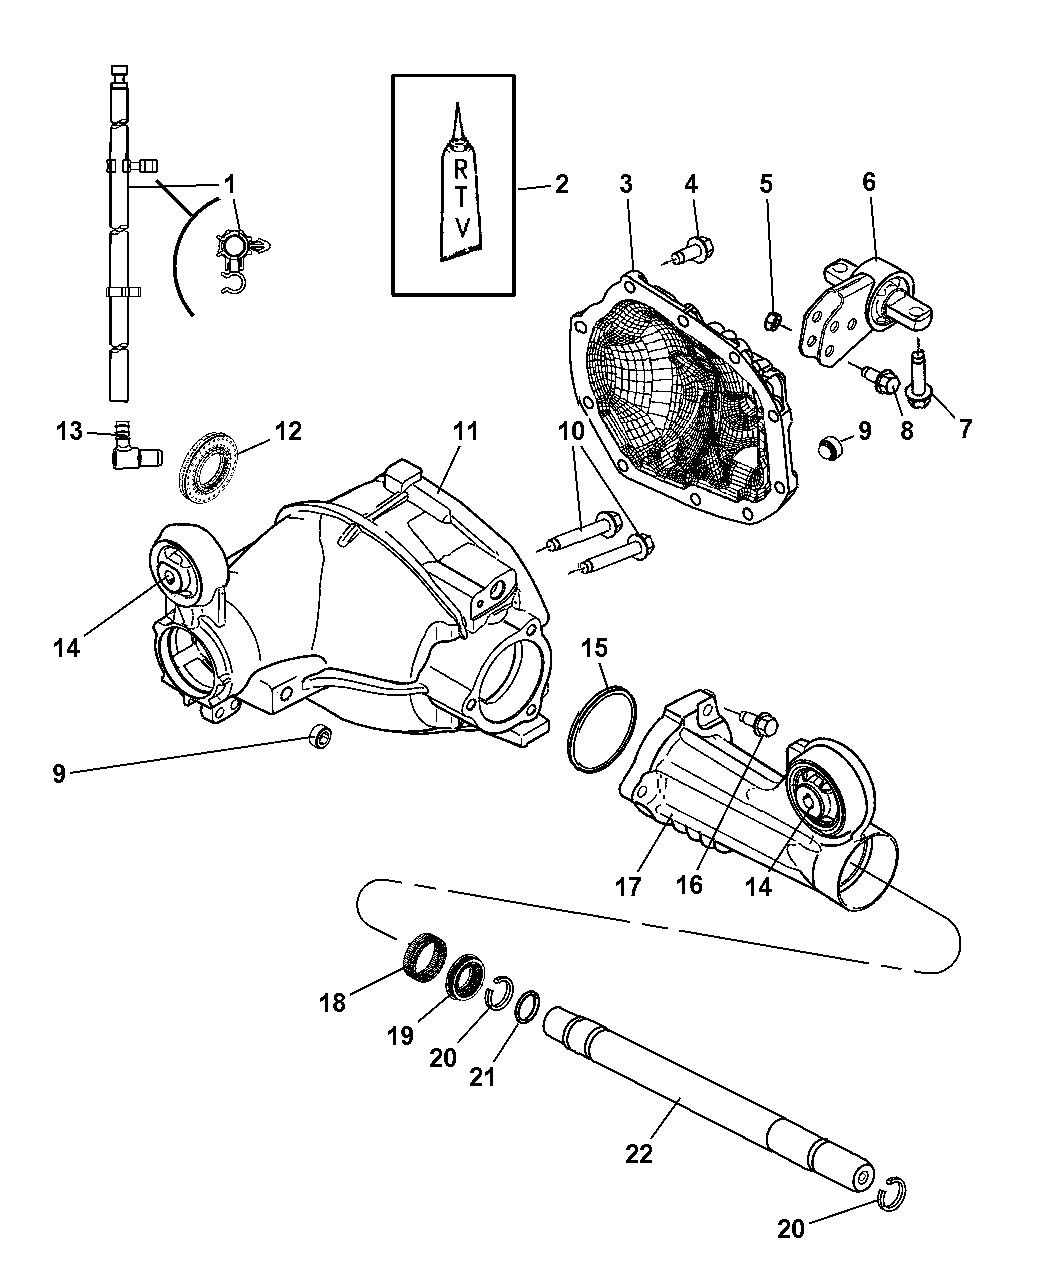 2008 Jeep Grand Cherokee Parts Diagram